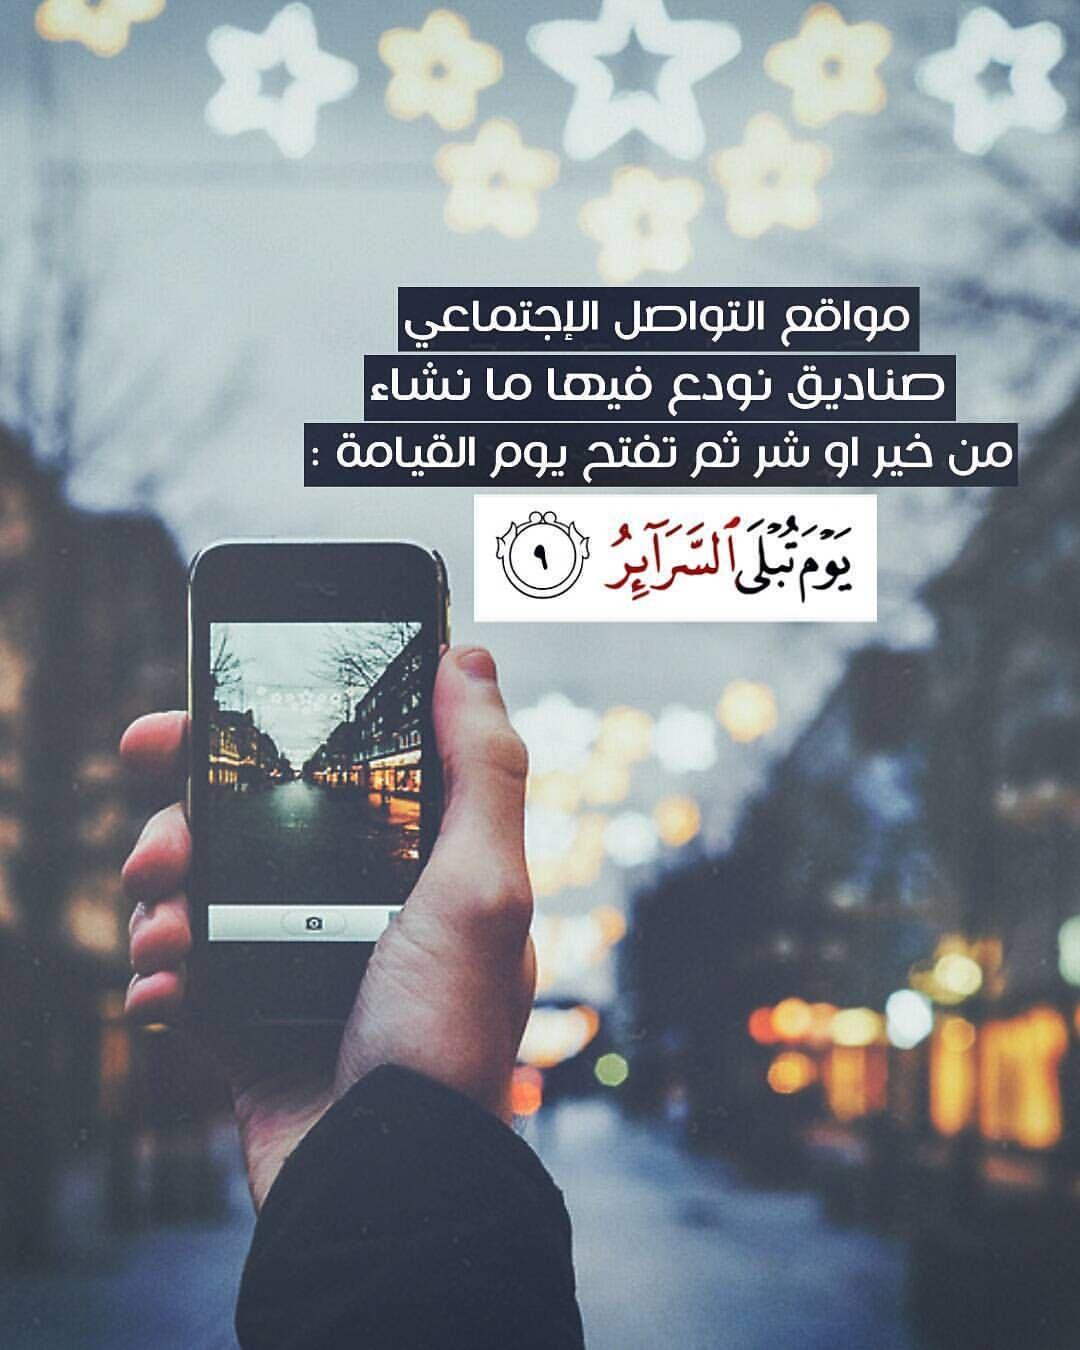 آية و حكمة Quran Quotes Verses Quran Book Ex Quotes